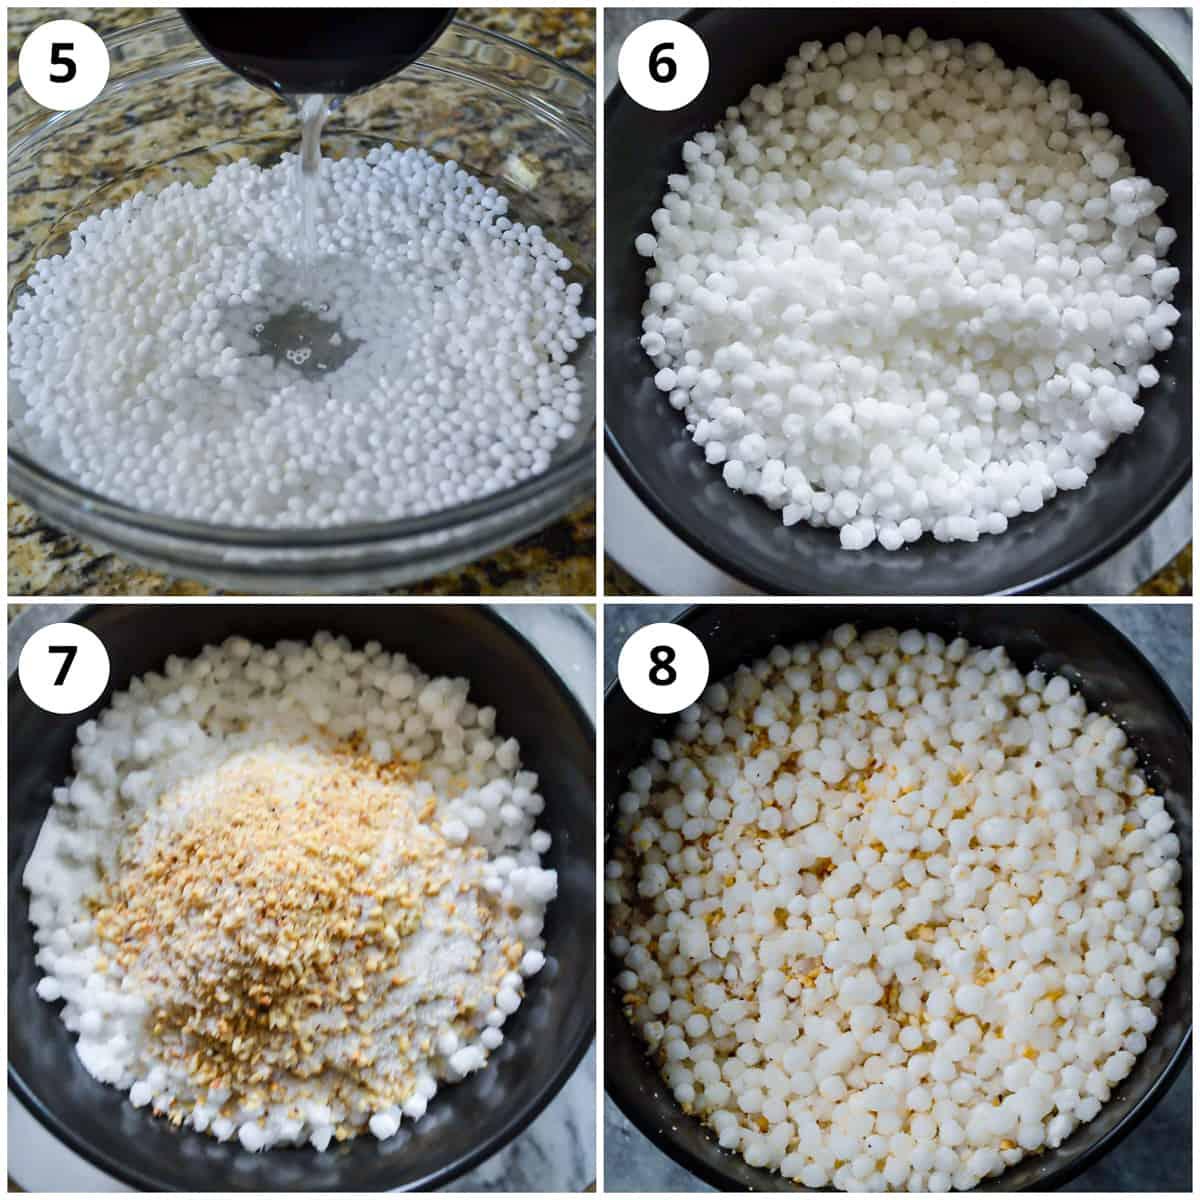 Soaking sabudana and then adding crushed peanuts, salt and sugar to it.